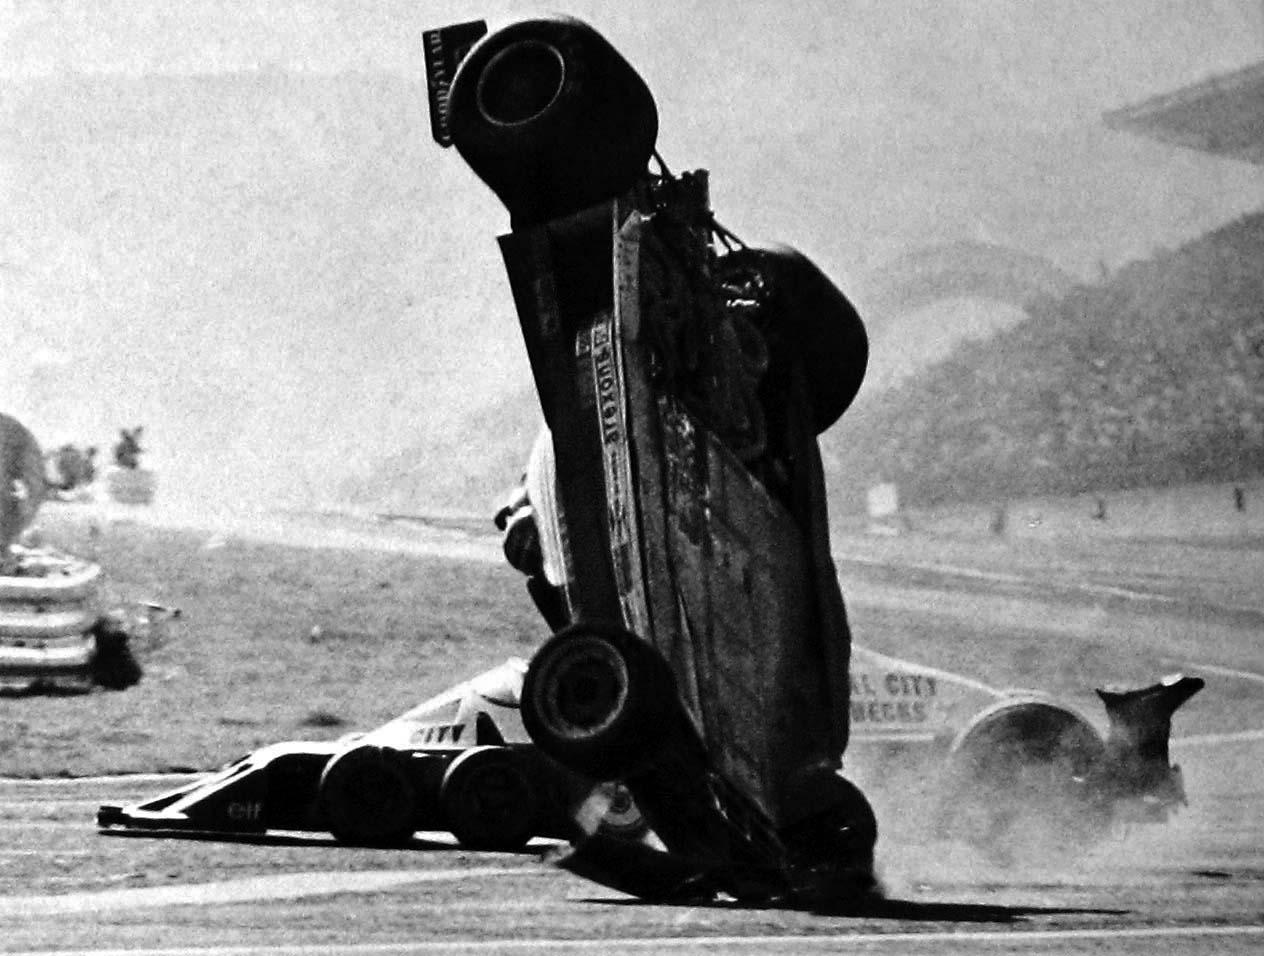 1977gillesvilleneuvefer 05 Gilles Villeneuve and Ronnie Peterson Accident   Fuji Speedway 1977